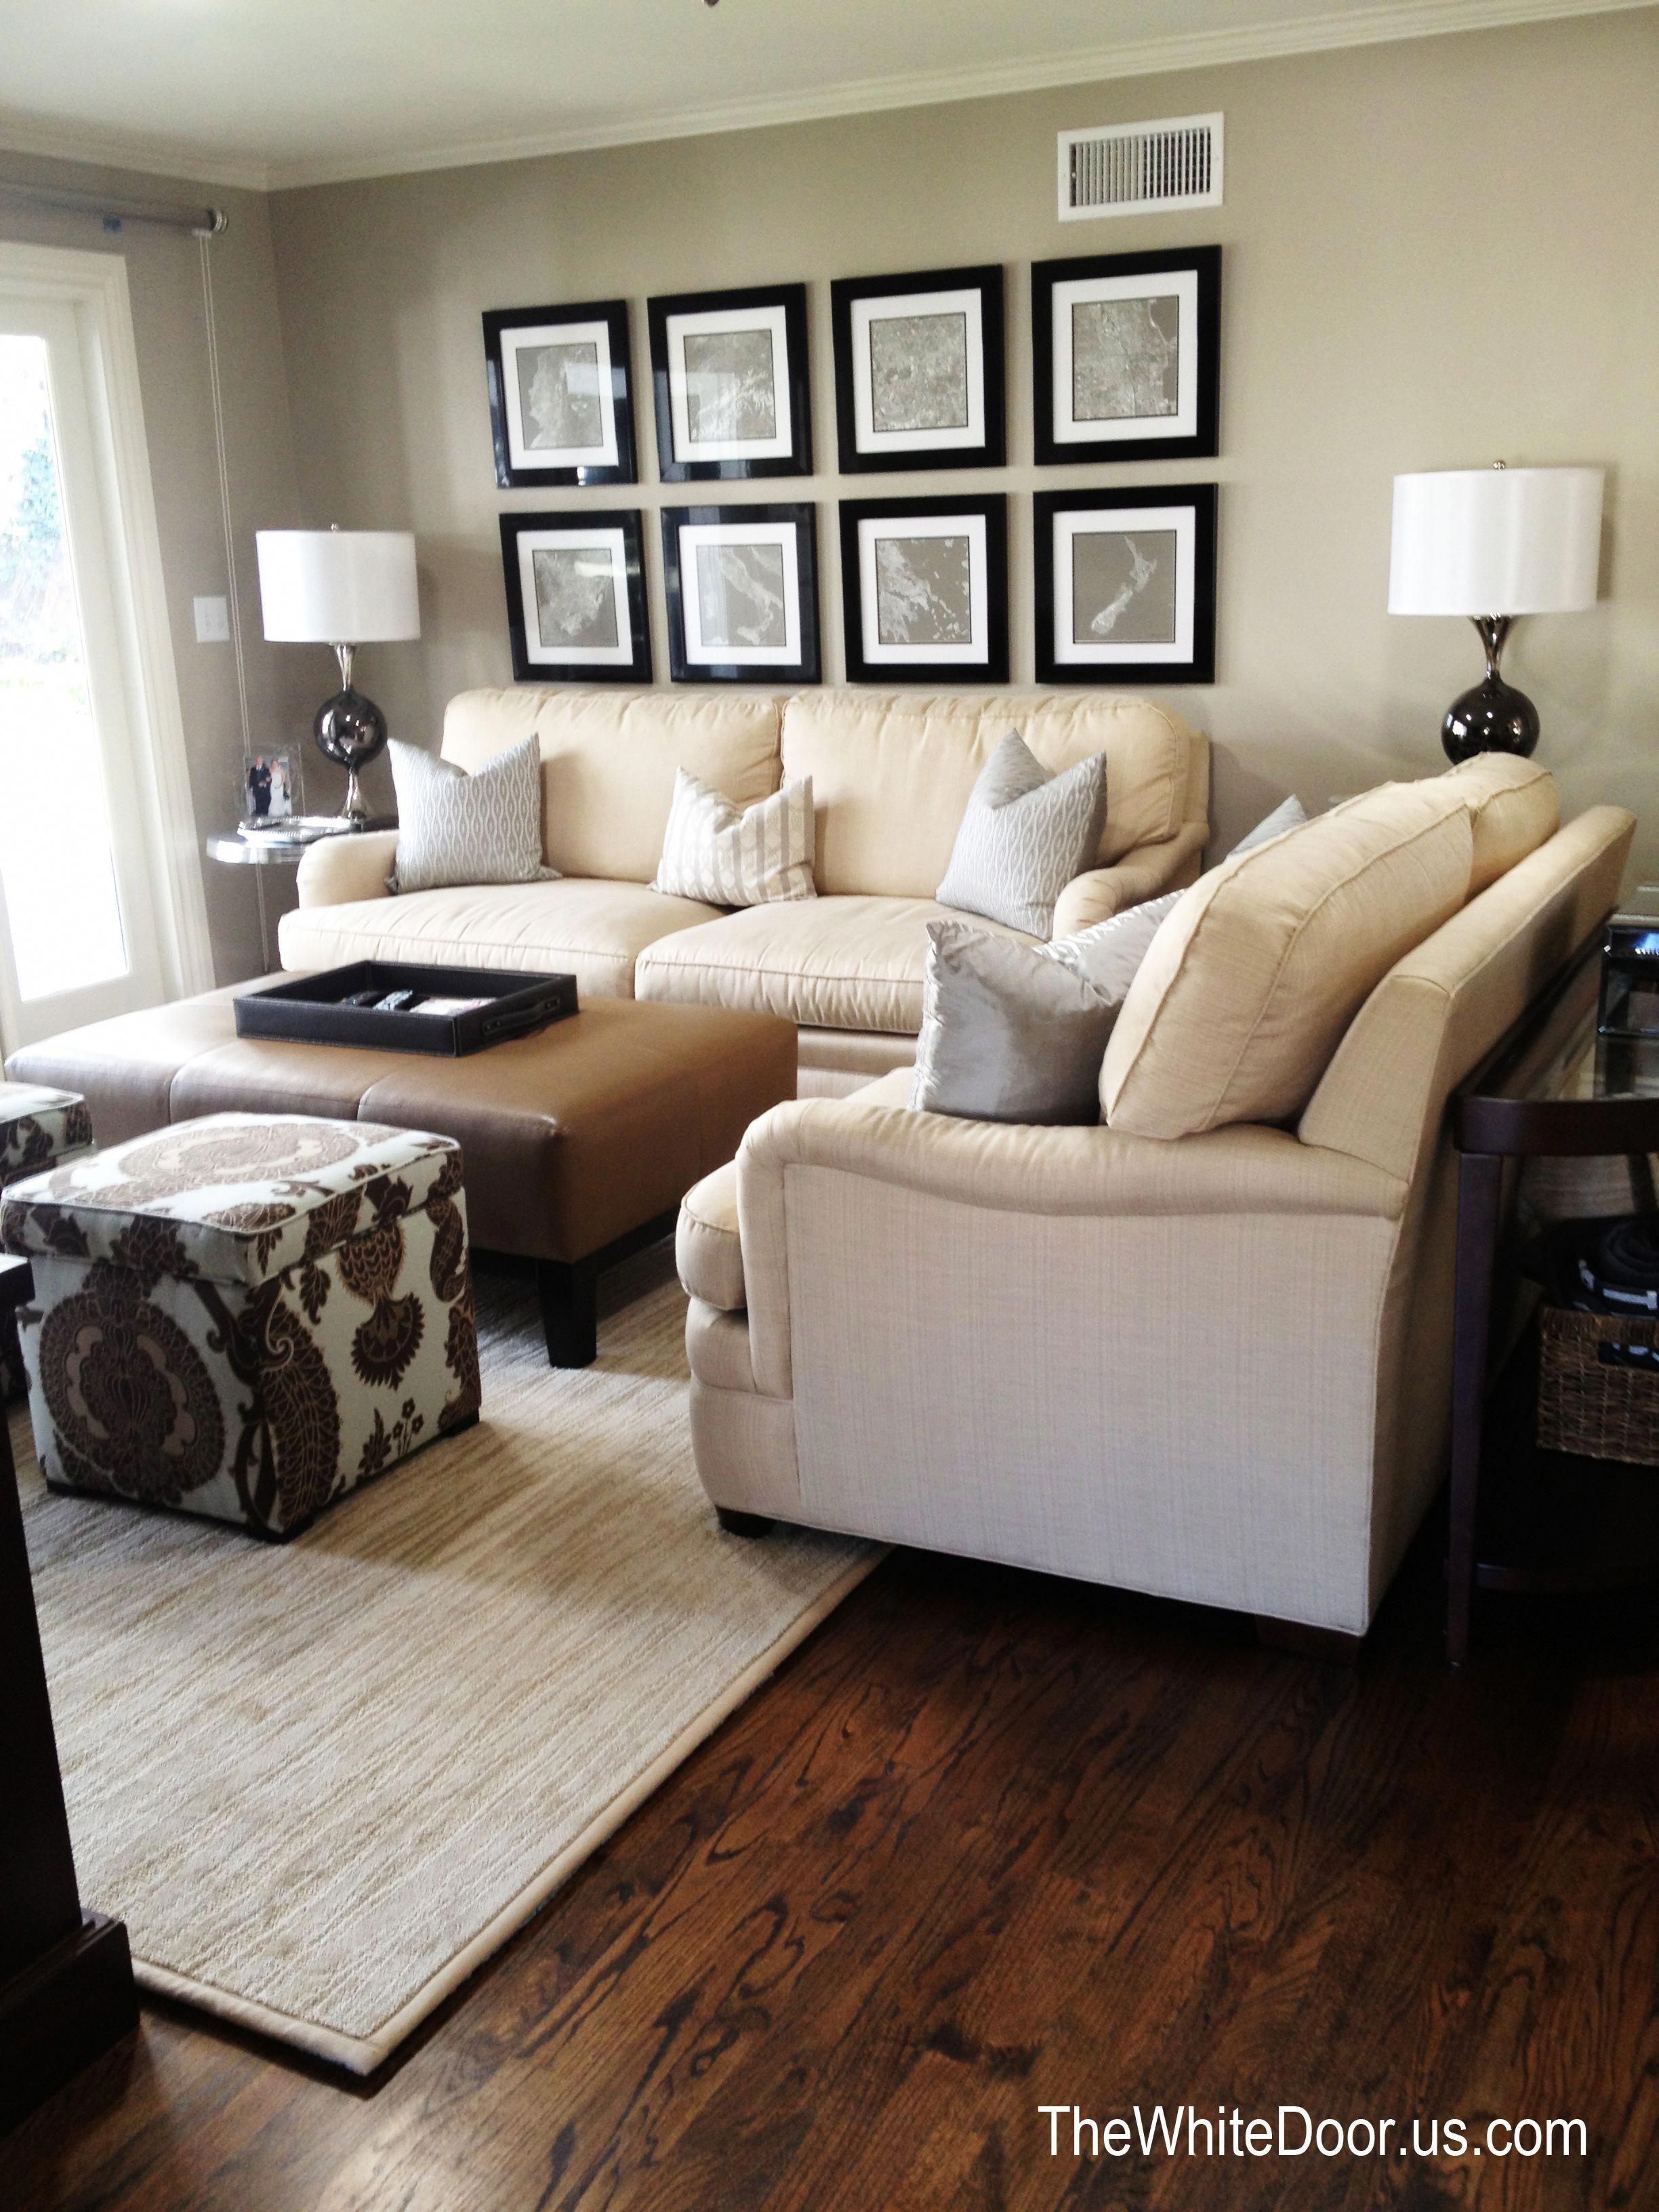 13 Fantastic Leather Sofa Dye Black White Leather Sofa Set Furniturecustom Furniturekekini Beige Couch Decor Leather Sofa Living Room Brown Living Room Decor